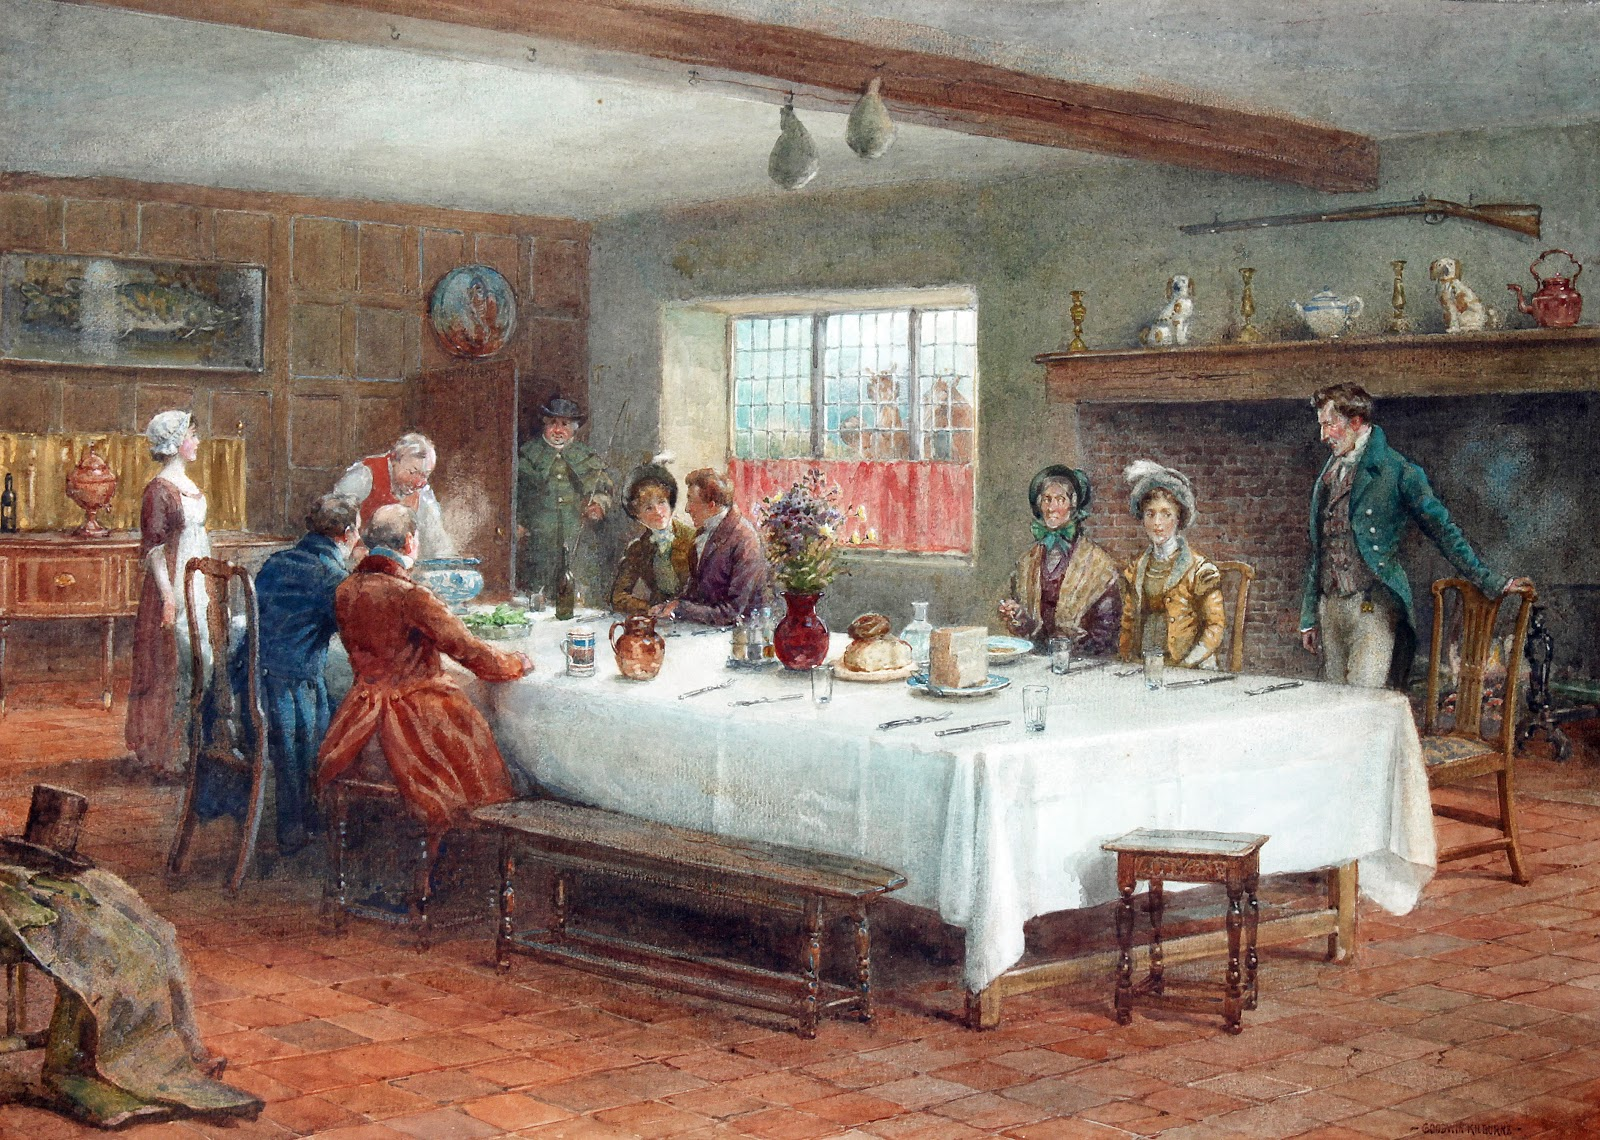 George Goodwin Kilburne, A Meal Stop at a Coaching Inn